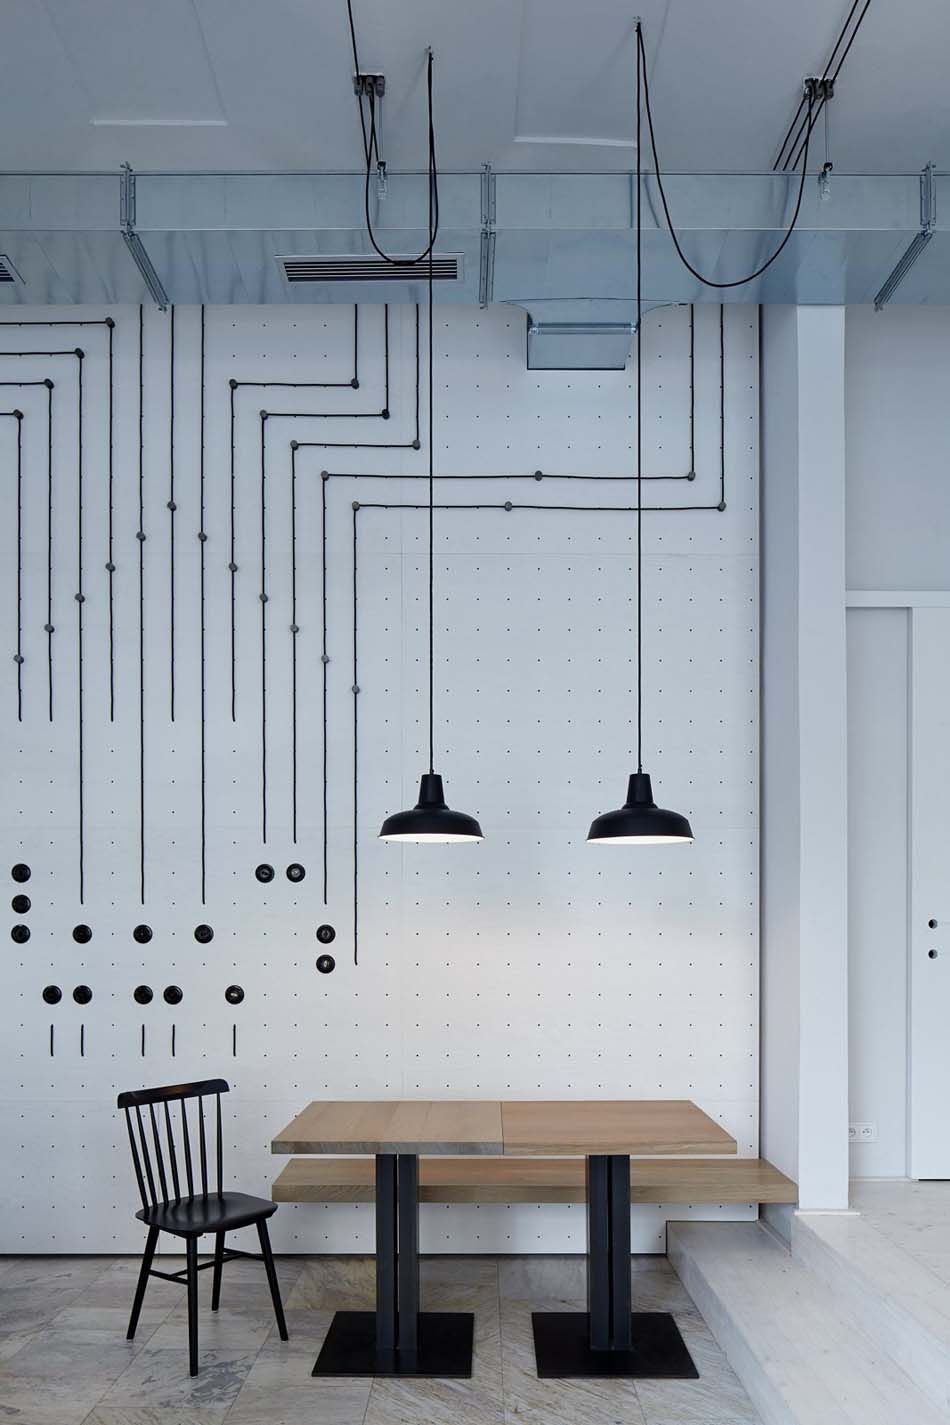 Attrayant Bistro Cafe With A Minimalist, Artistic Design Concept